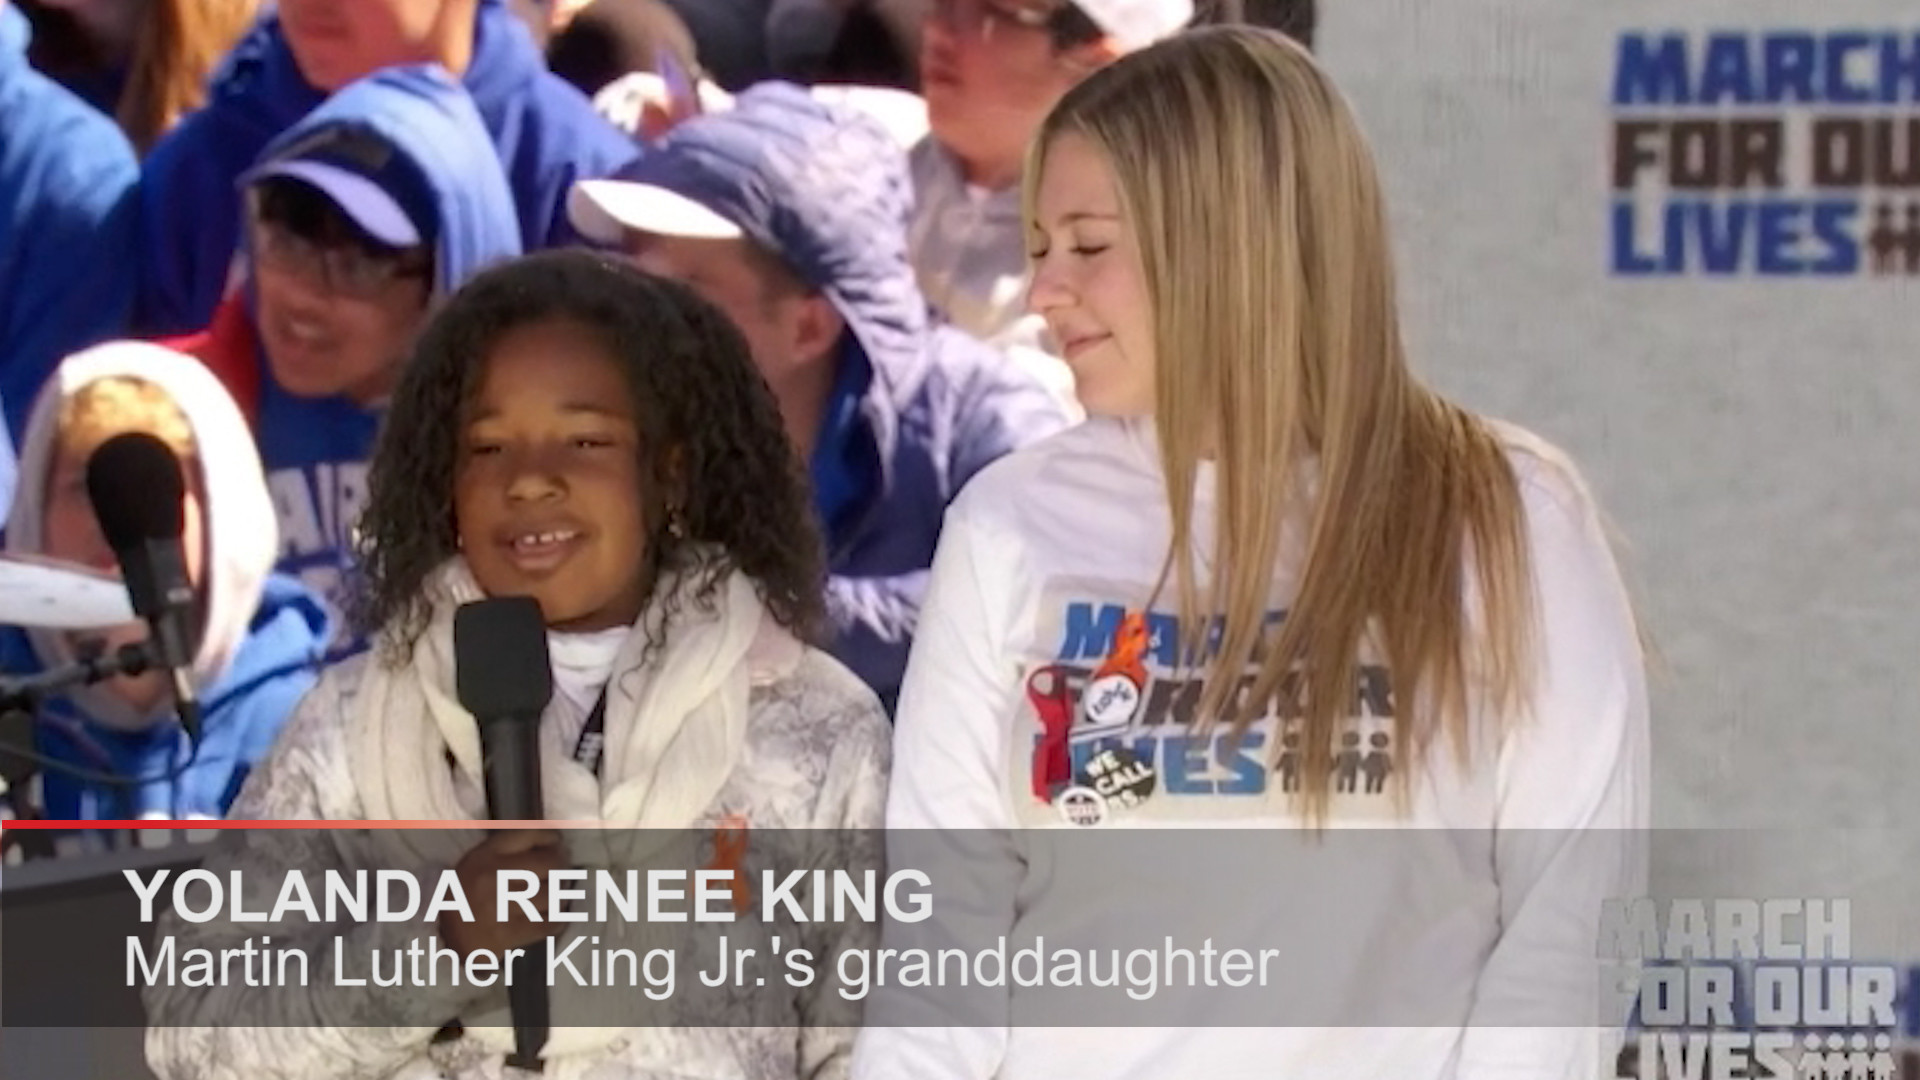 Martin Luther King Jr S Granddaughter Yolanda Renee King Speaks